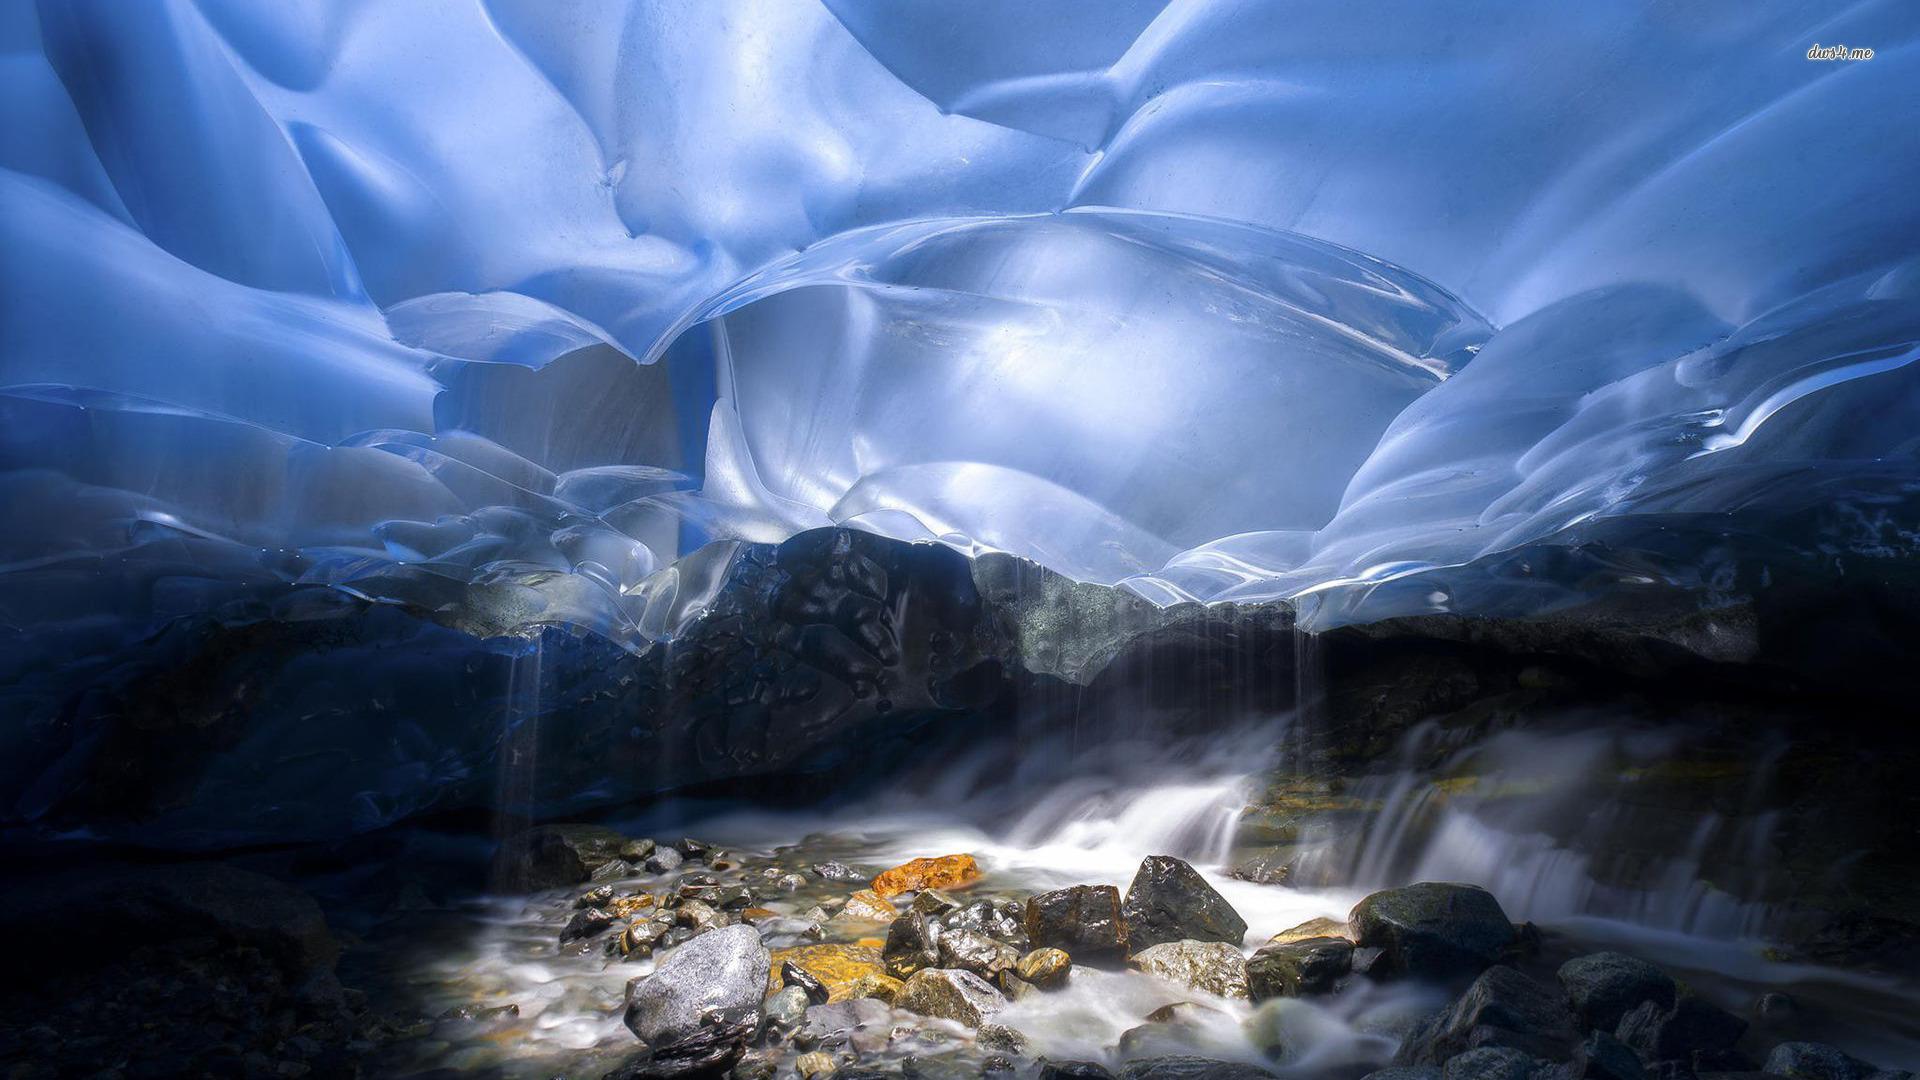 Alaskas Quotes About Nature Quotesgram